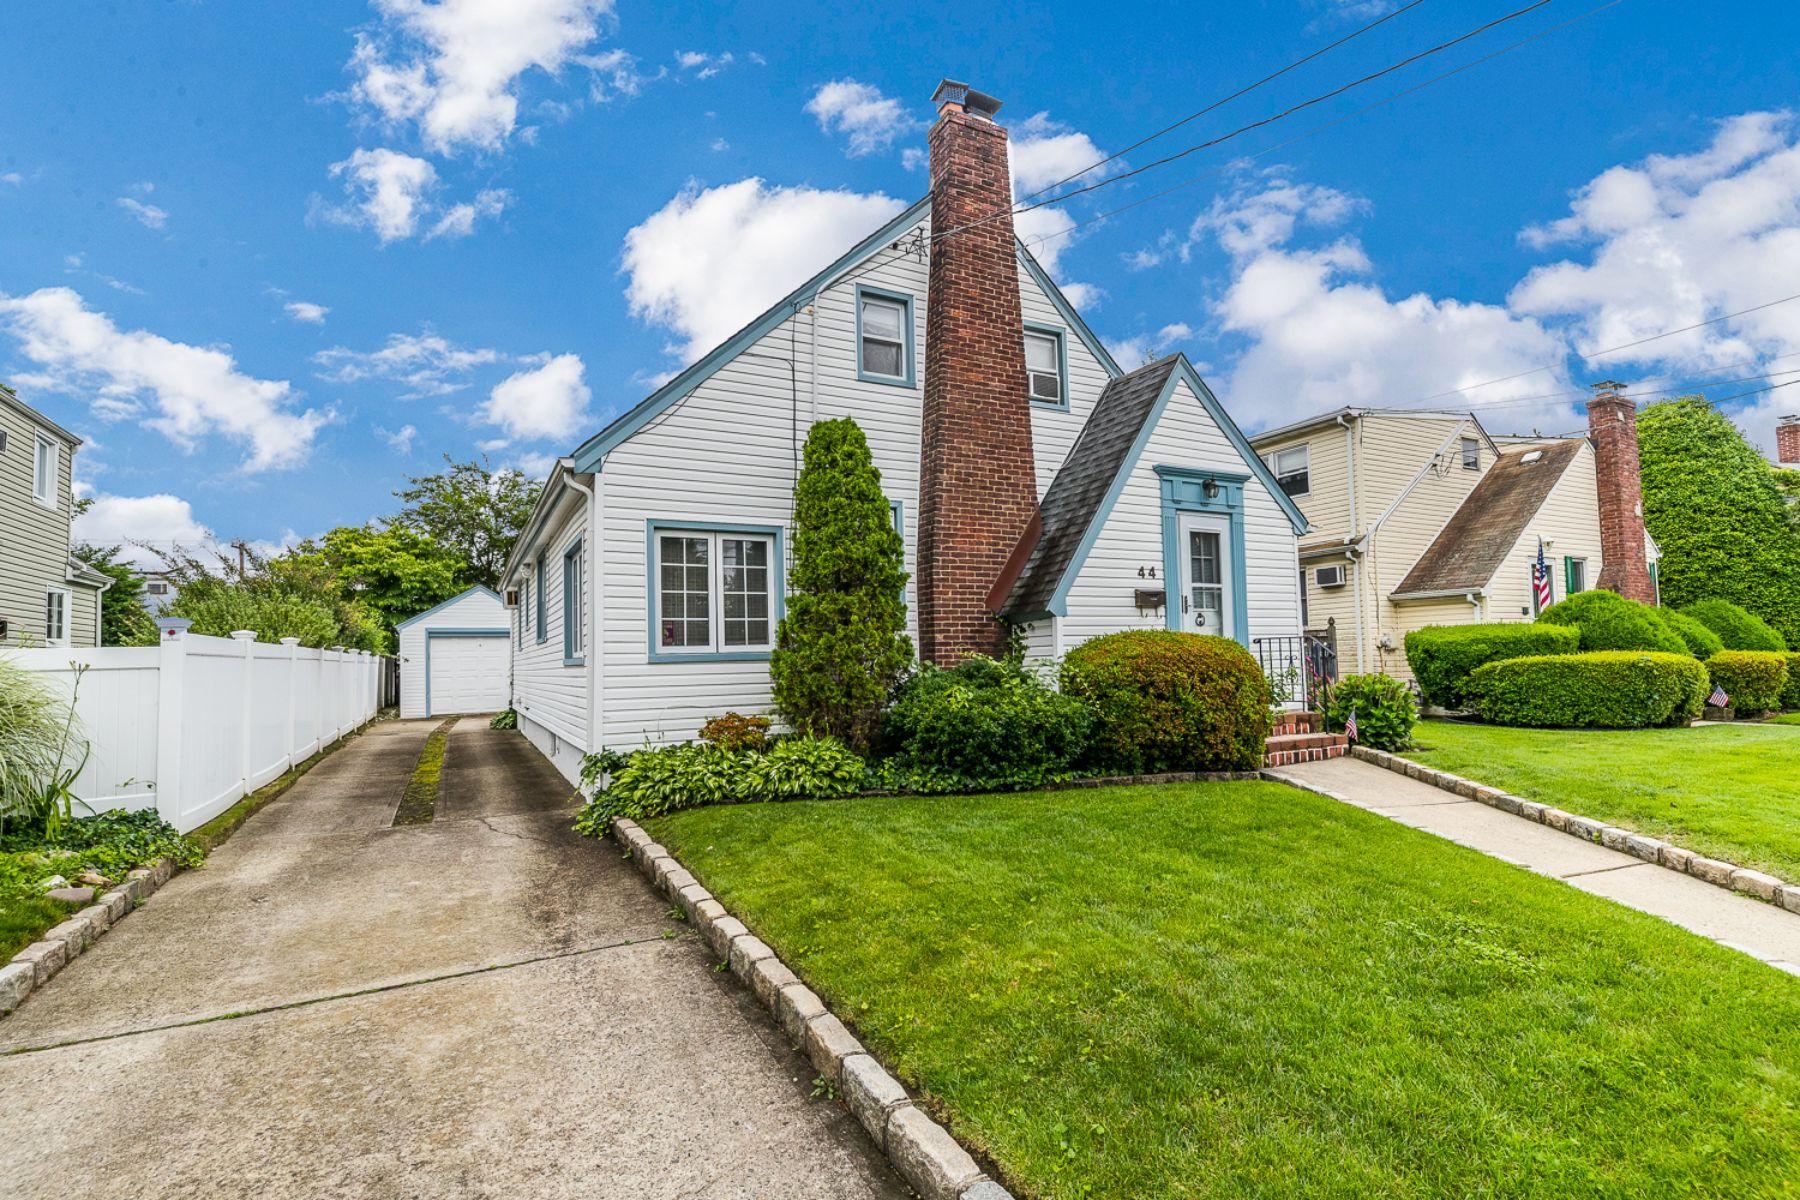 Single Family Homes for Sale at Malverne 44 Croyden St Malverne, New York 11565 United States